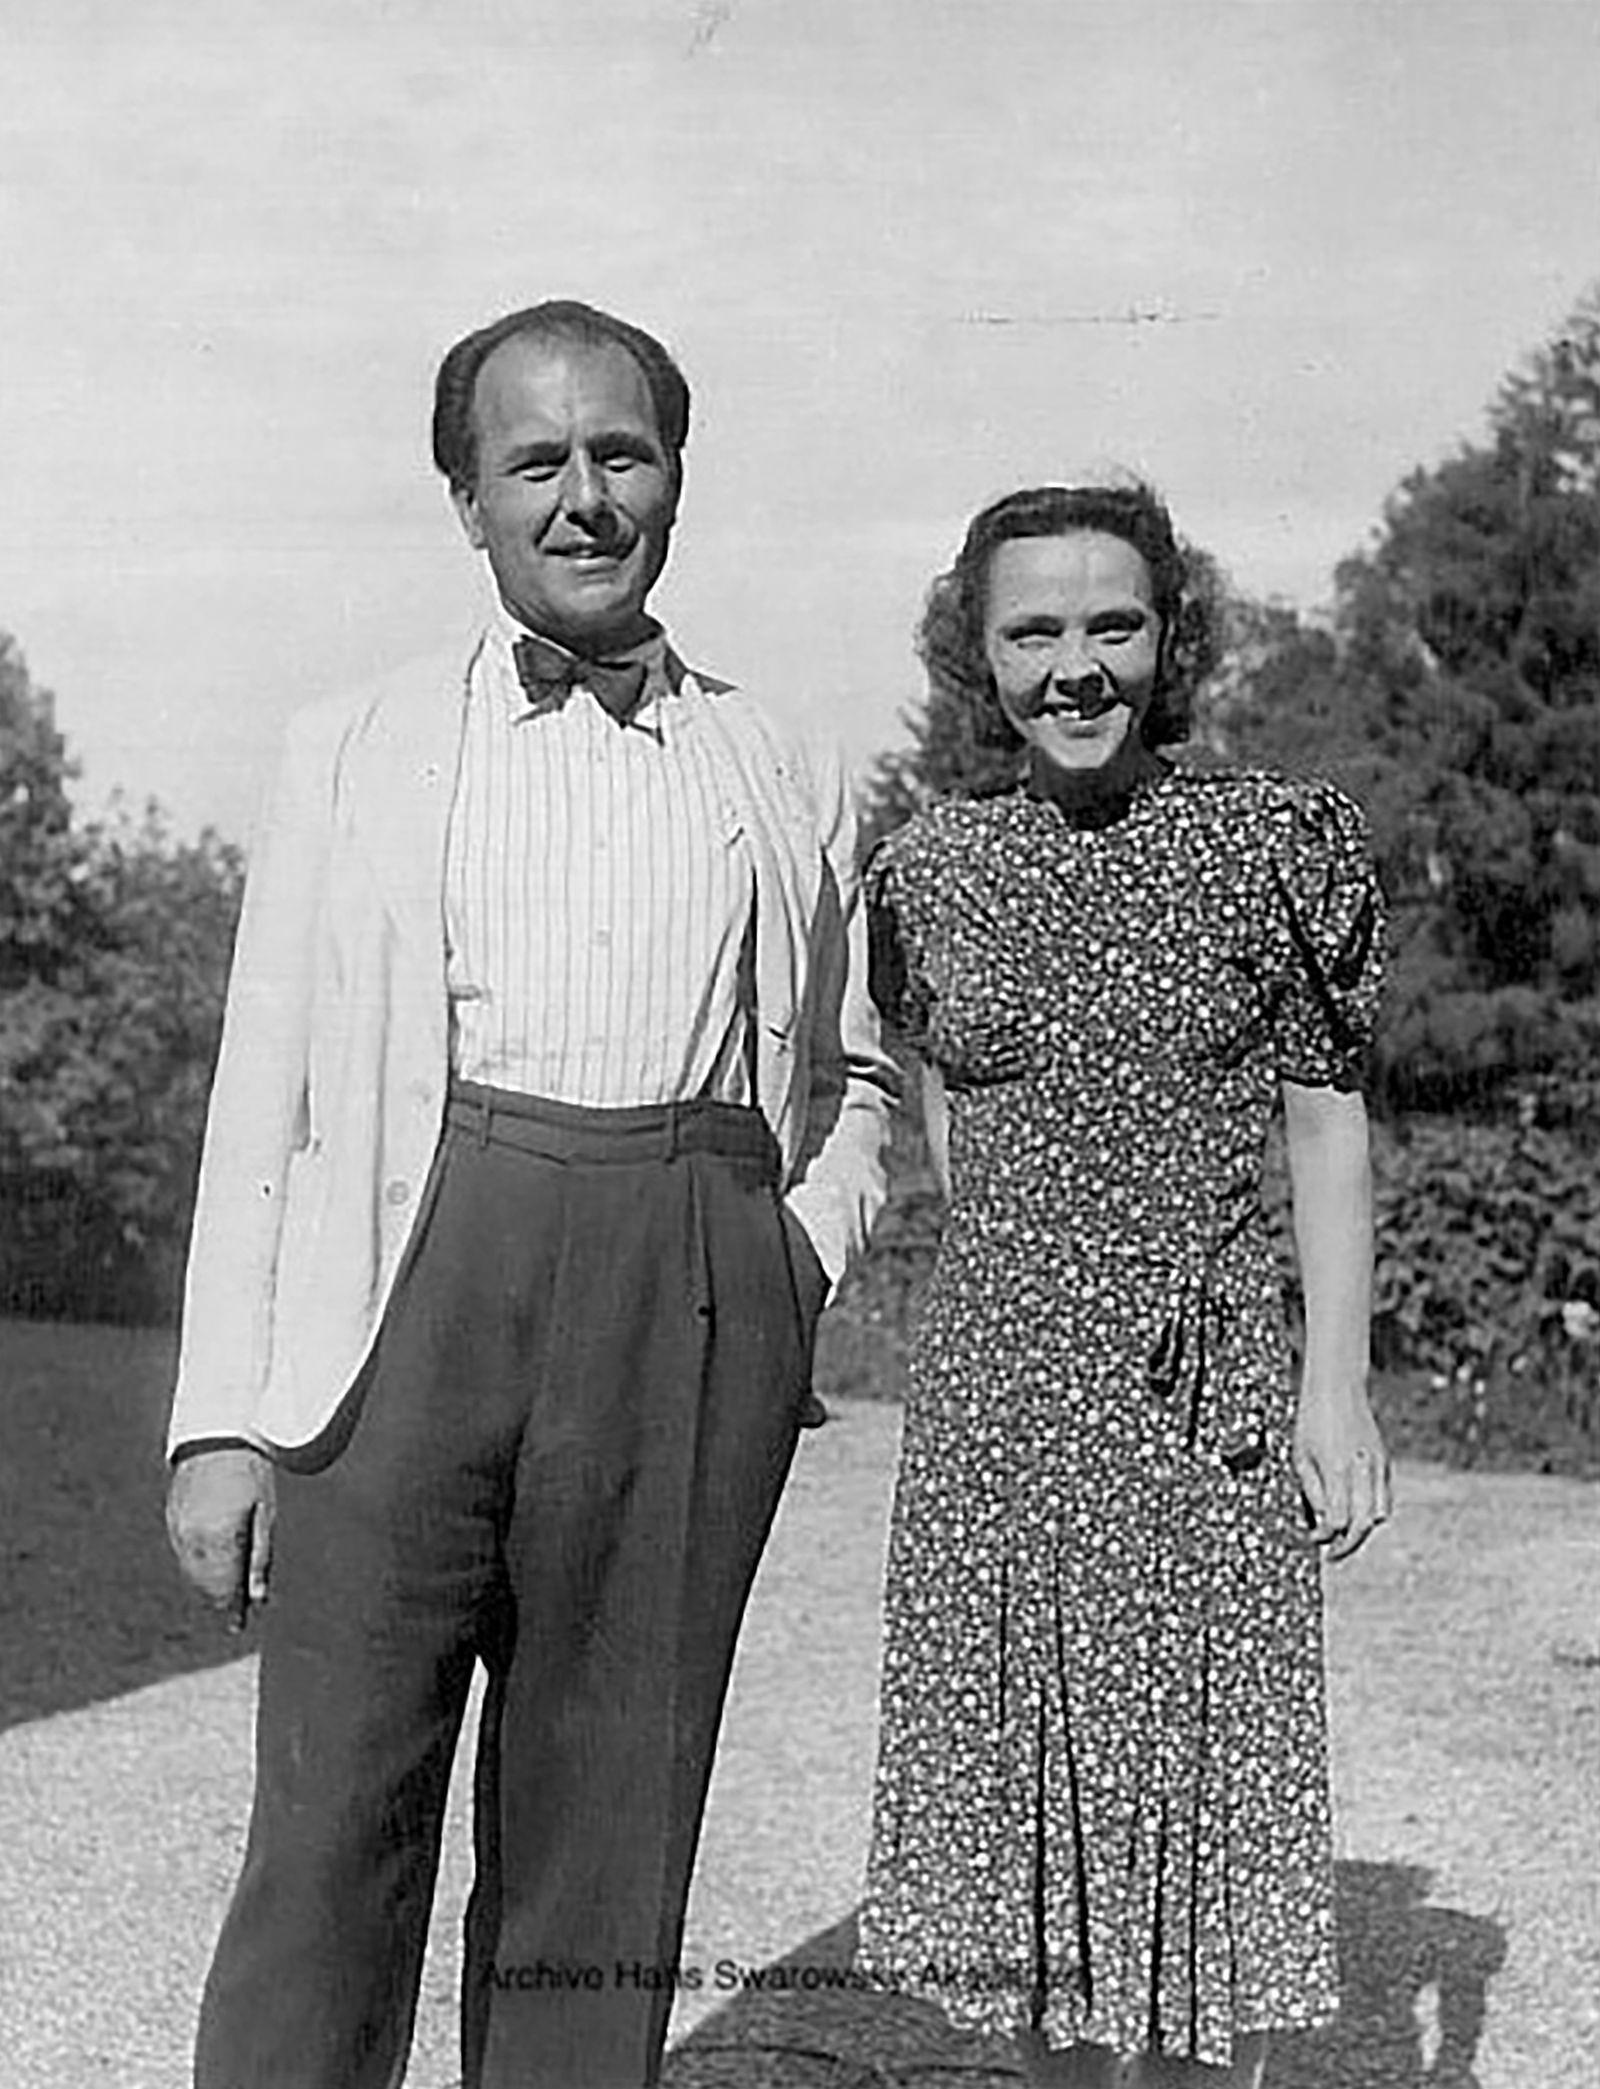 Hans Swarowsky - Poecking 45 mit Maria